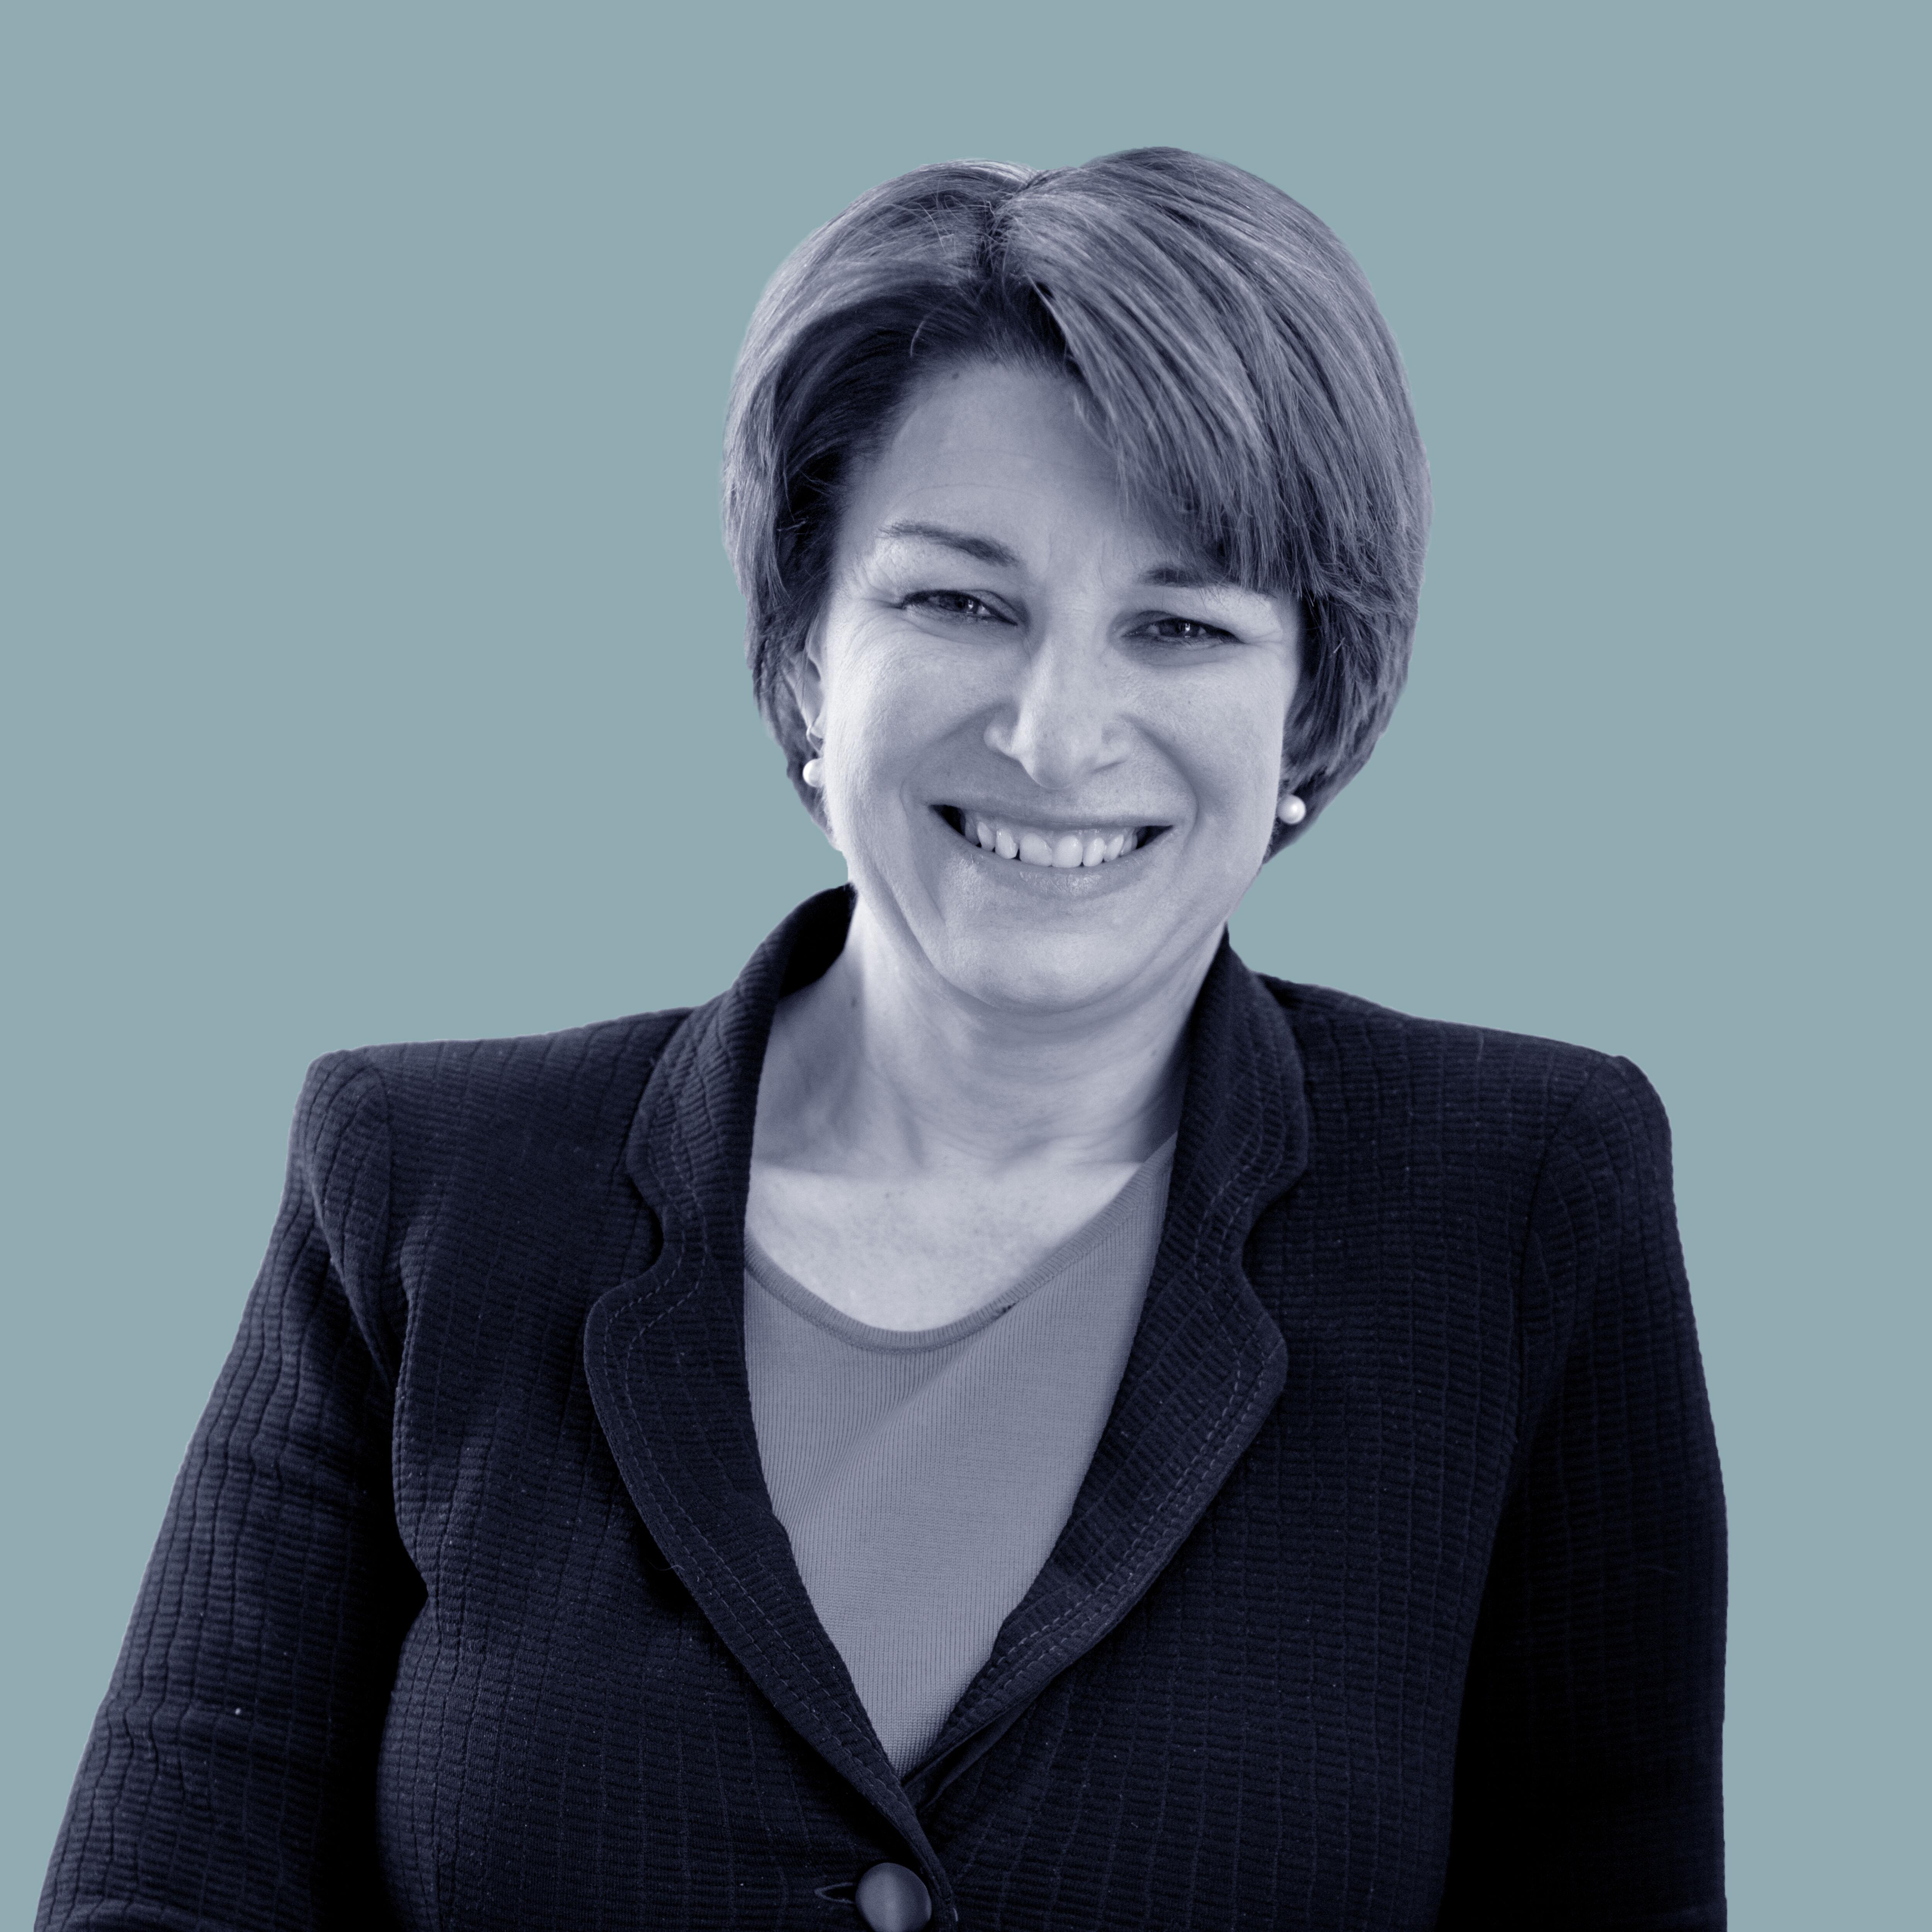 Senator Amy Klobuchar (D-Minn.)